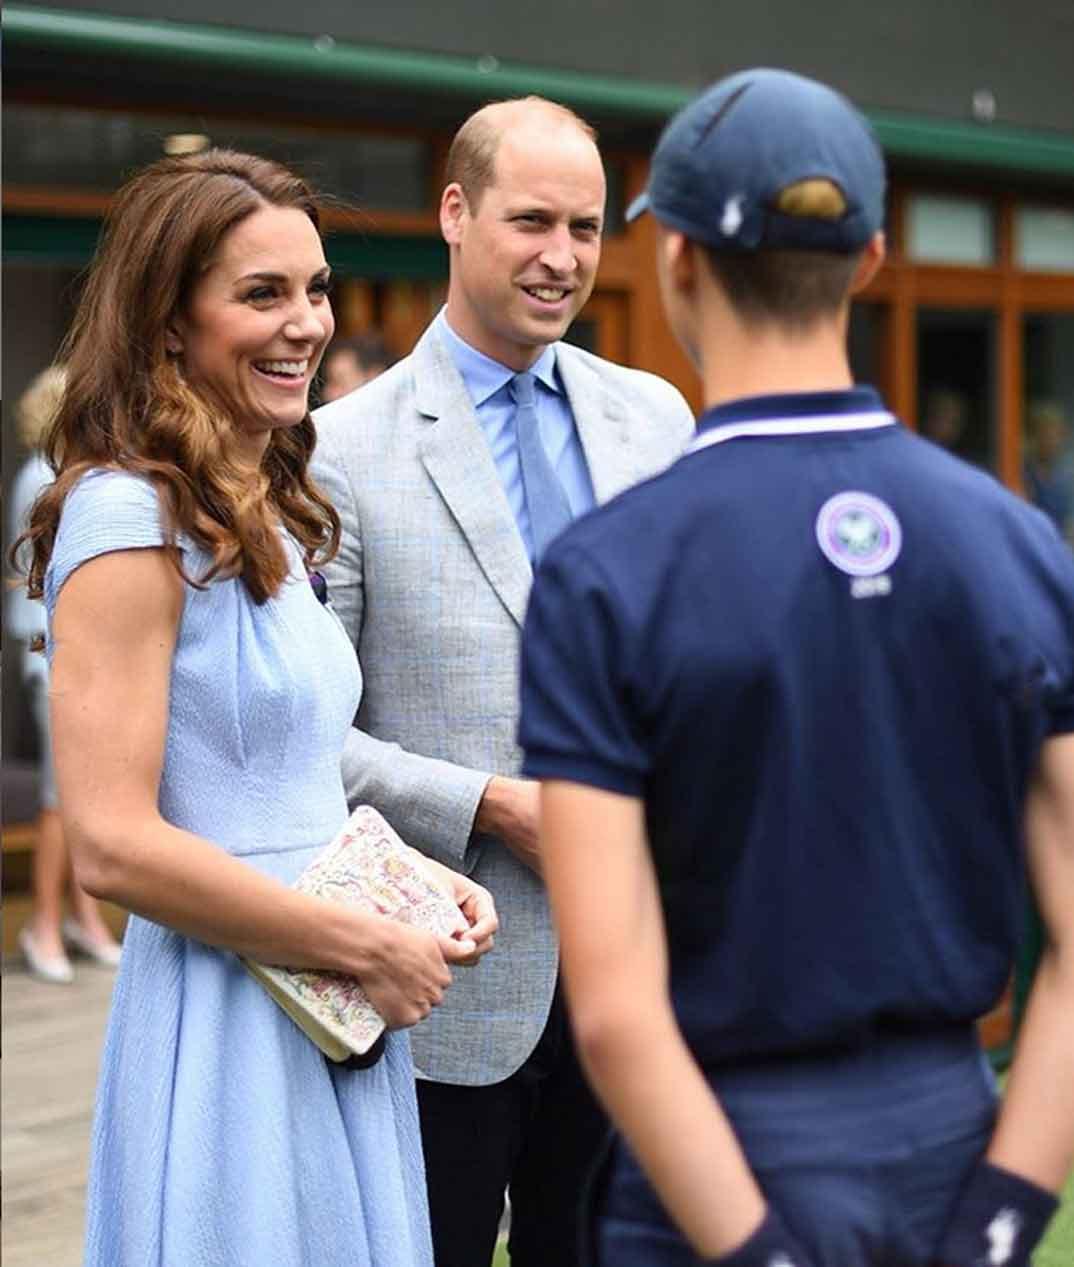 Duques de Cambridge Wimbledon © kesingtonroyal/Instagram